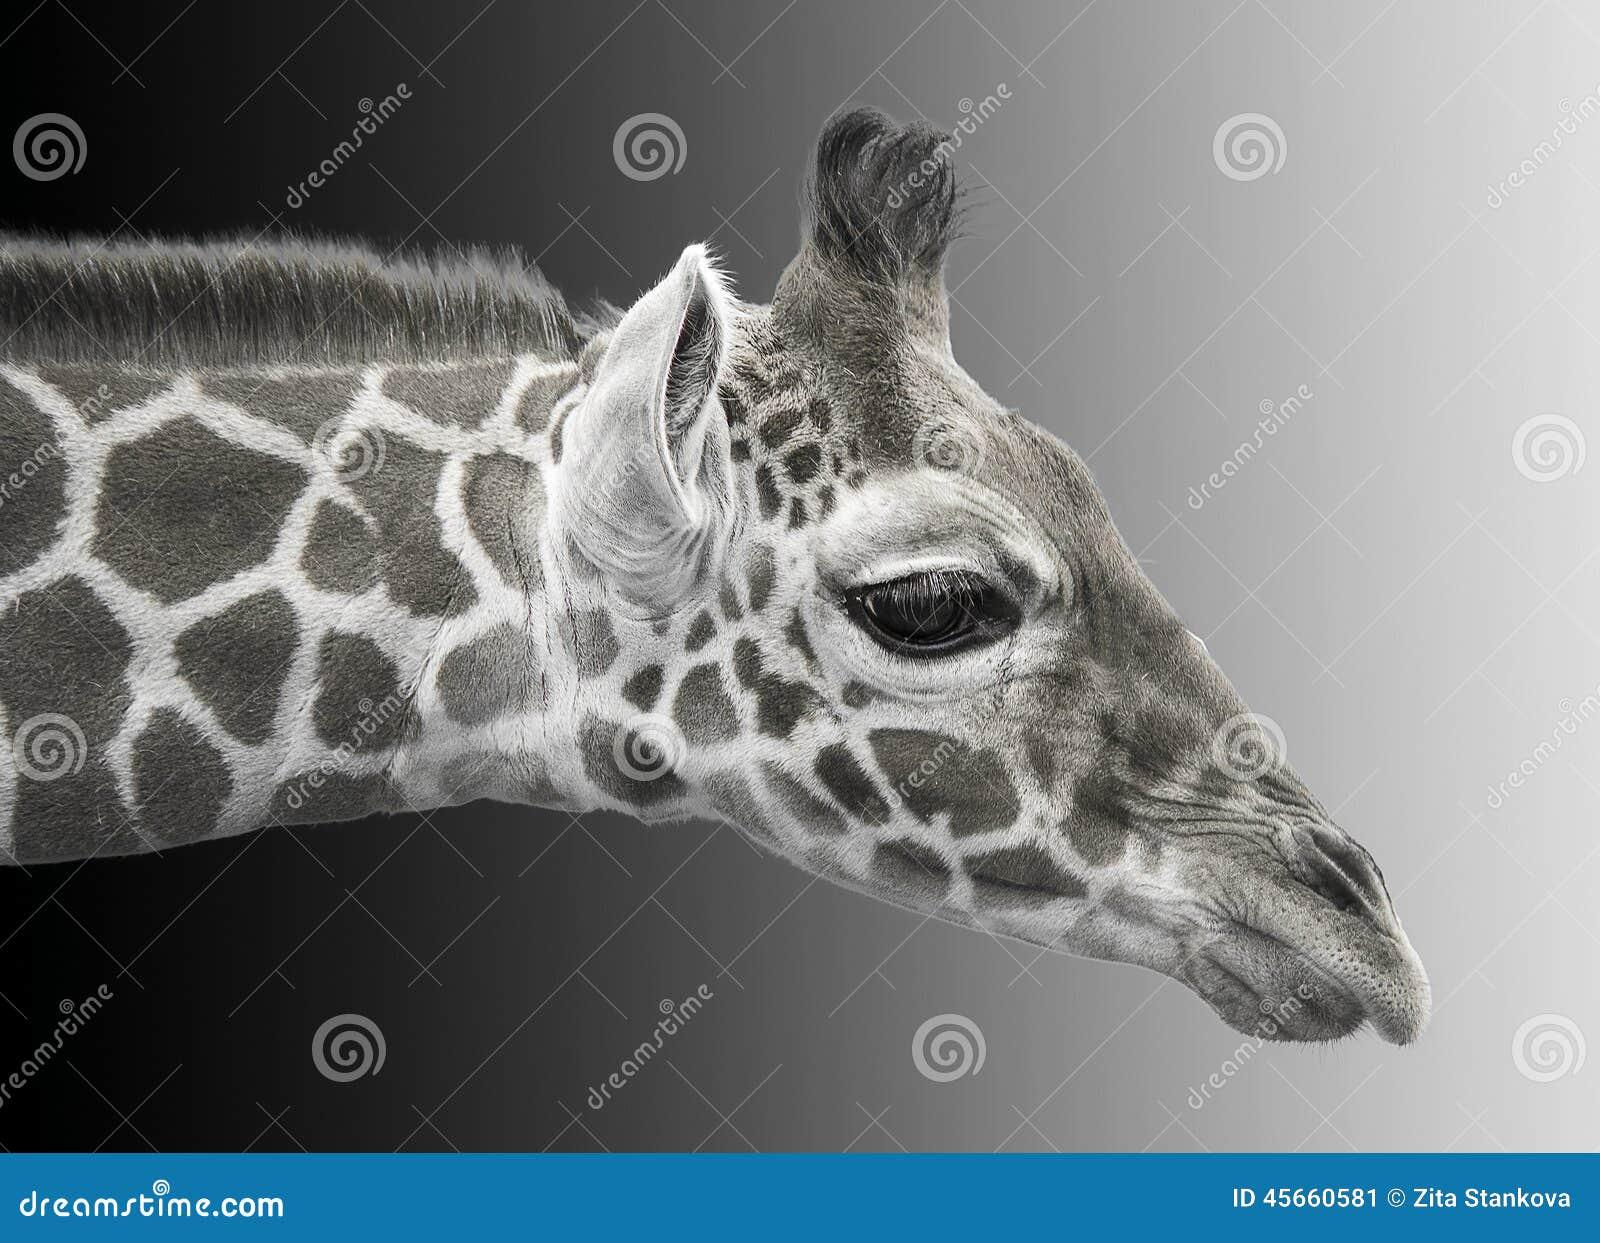 Image noire et blanche d 39 une jeune girafe image stock for Prix d une girafe a poncer